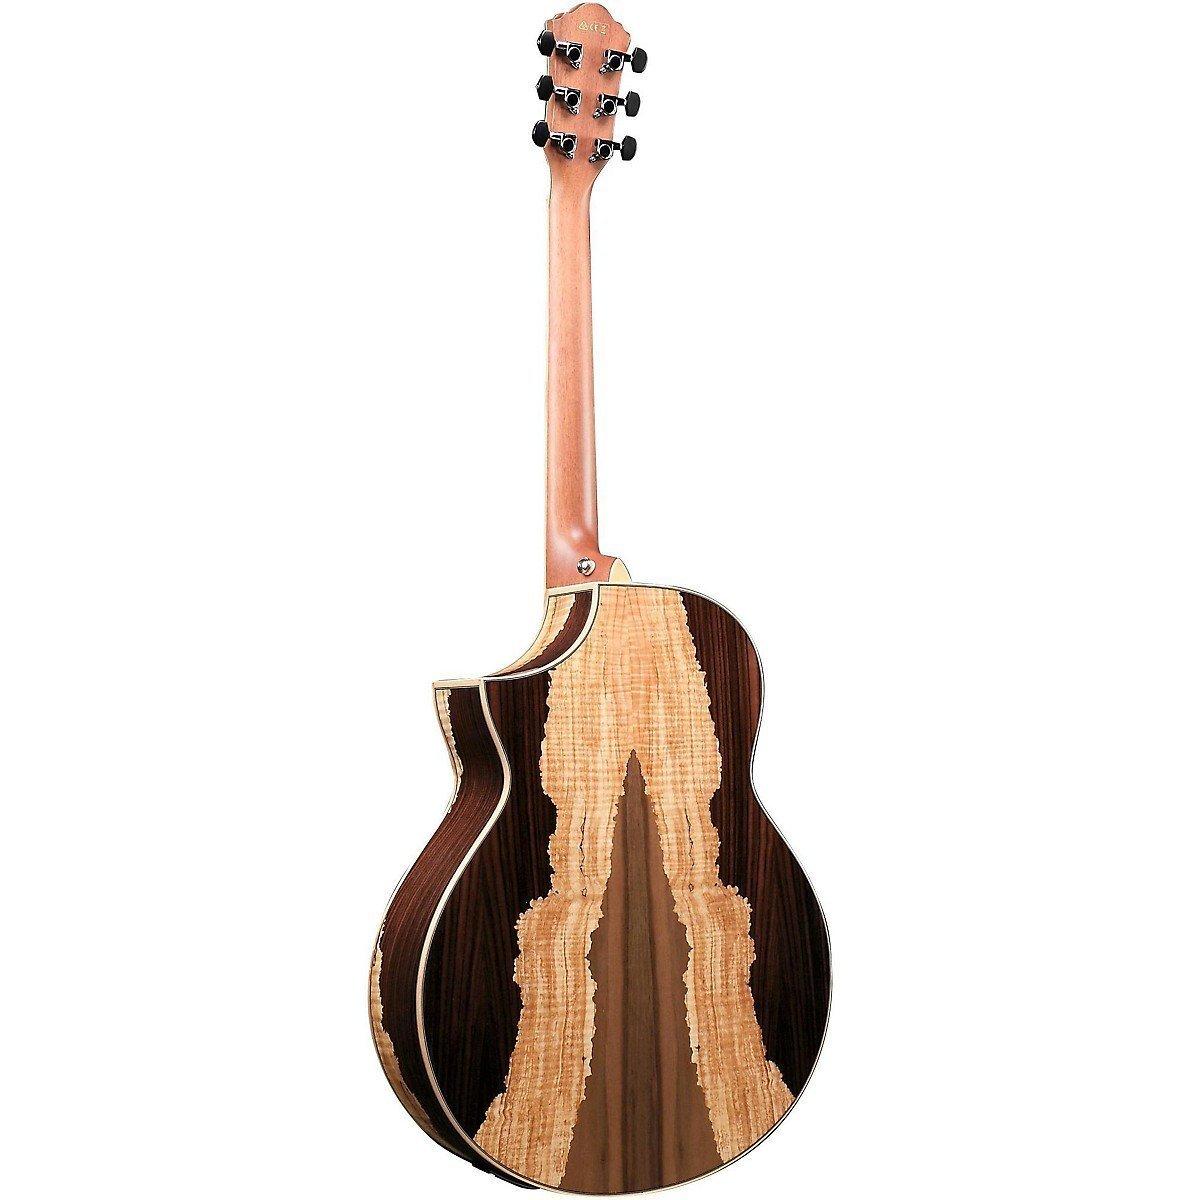 ibanez aew51 exotic wood acoustic electric guitar ebay. Black Bedroom Furniture Sets. Home Design Ideas